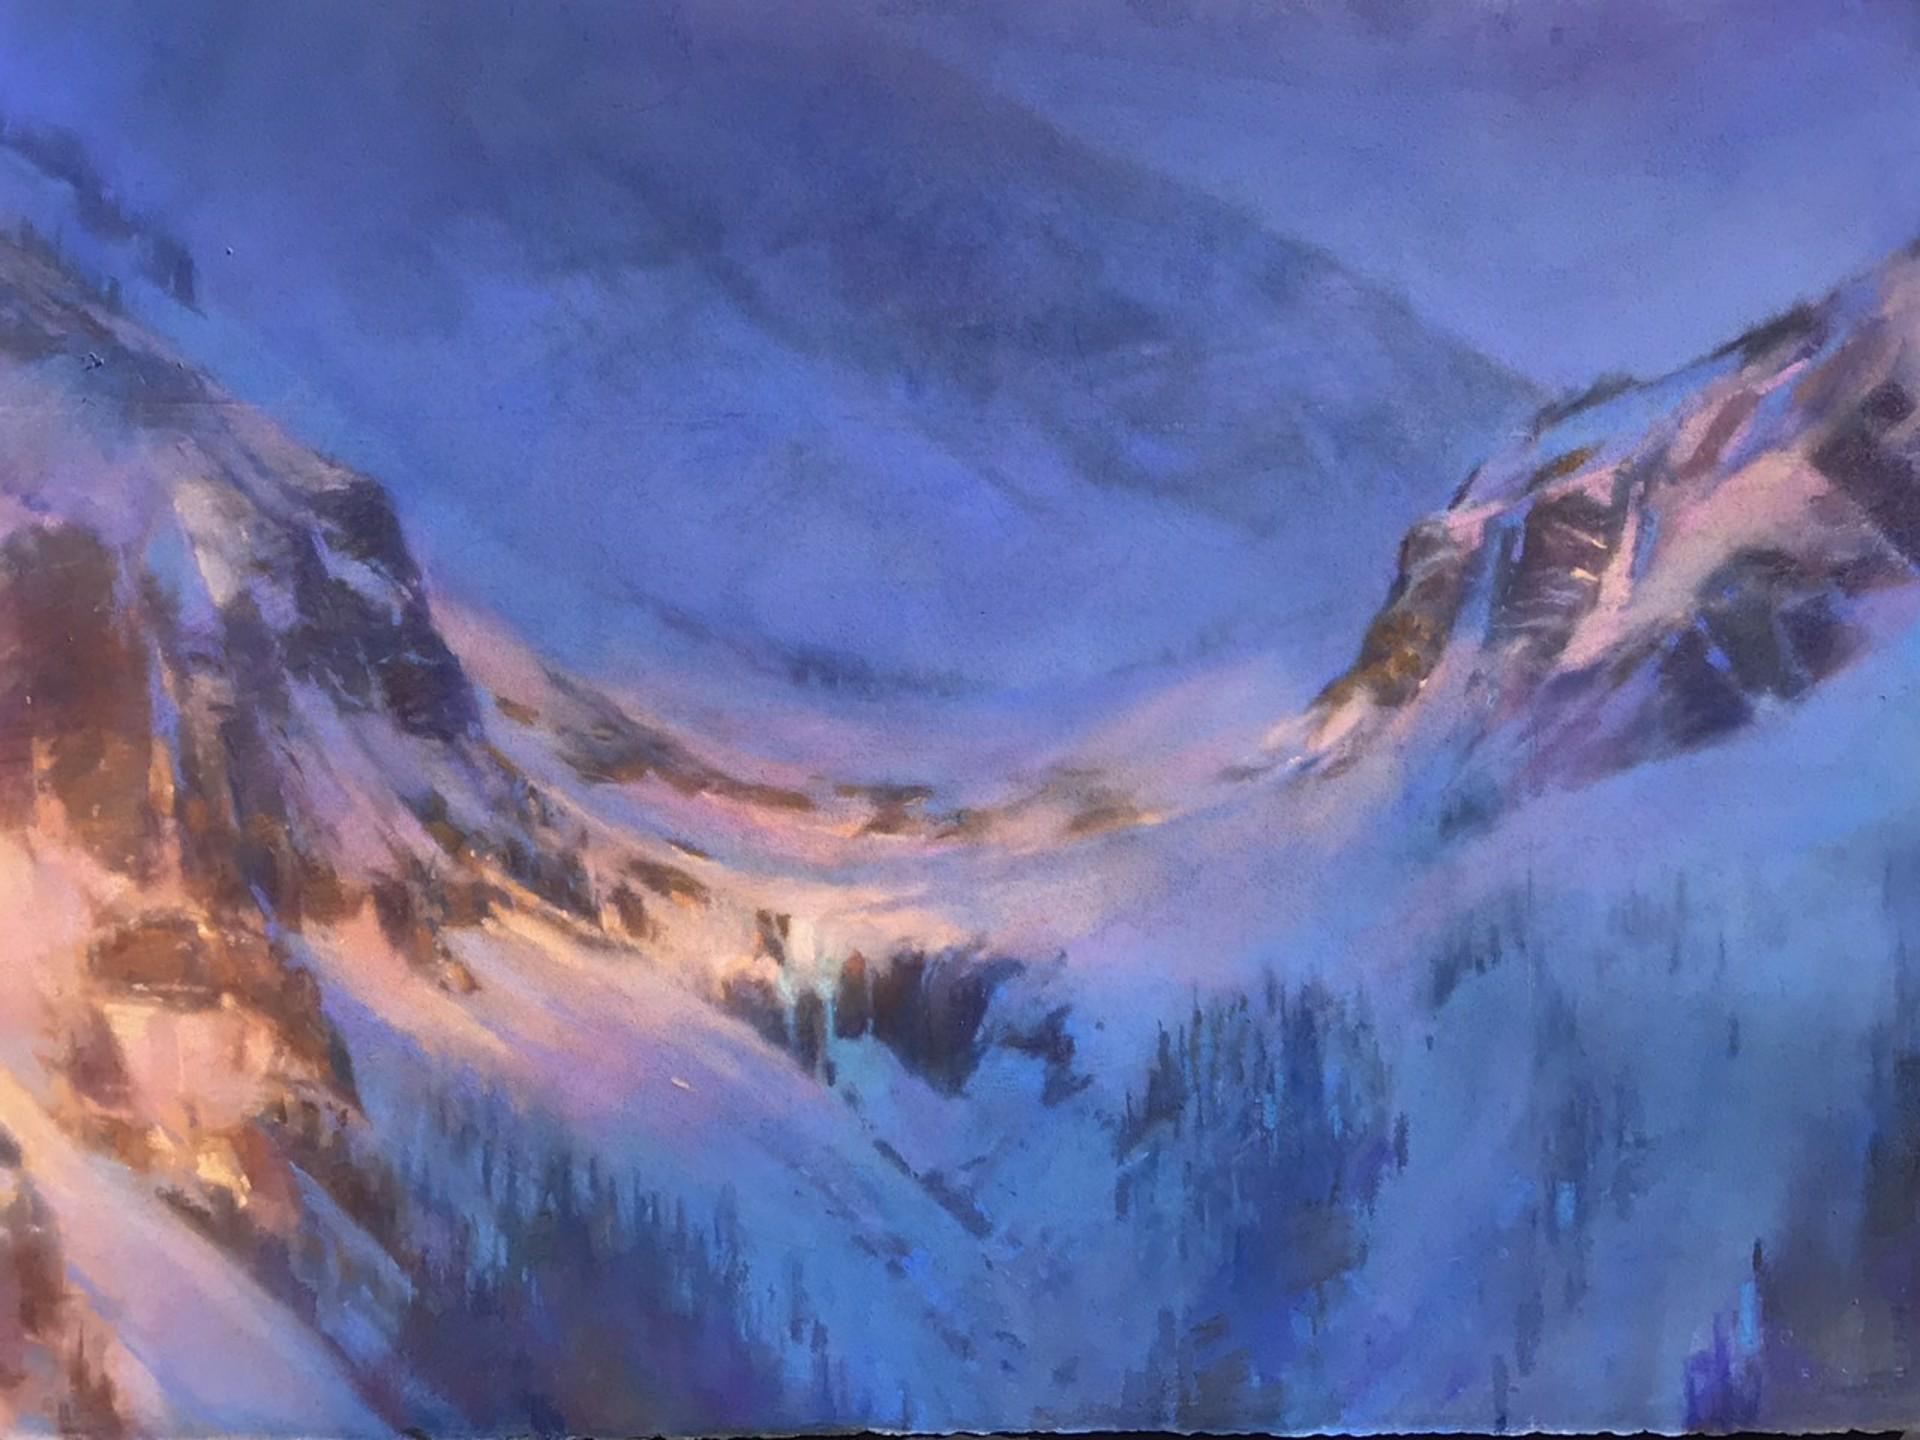 Telluride Peak After Storm by Bruce A Gómez